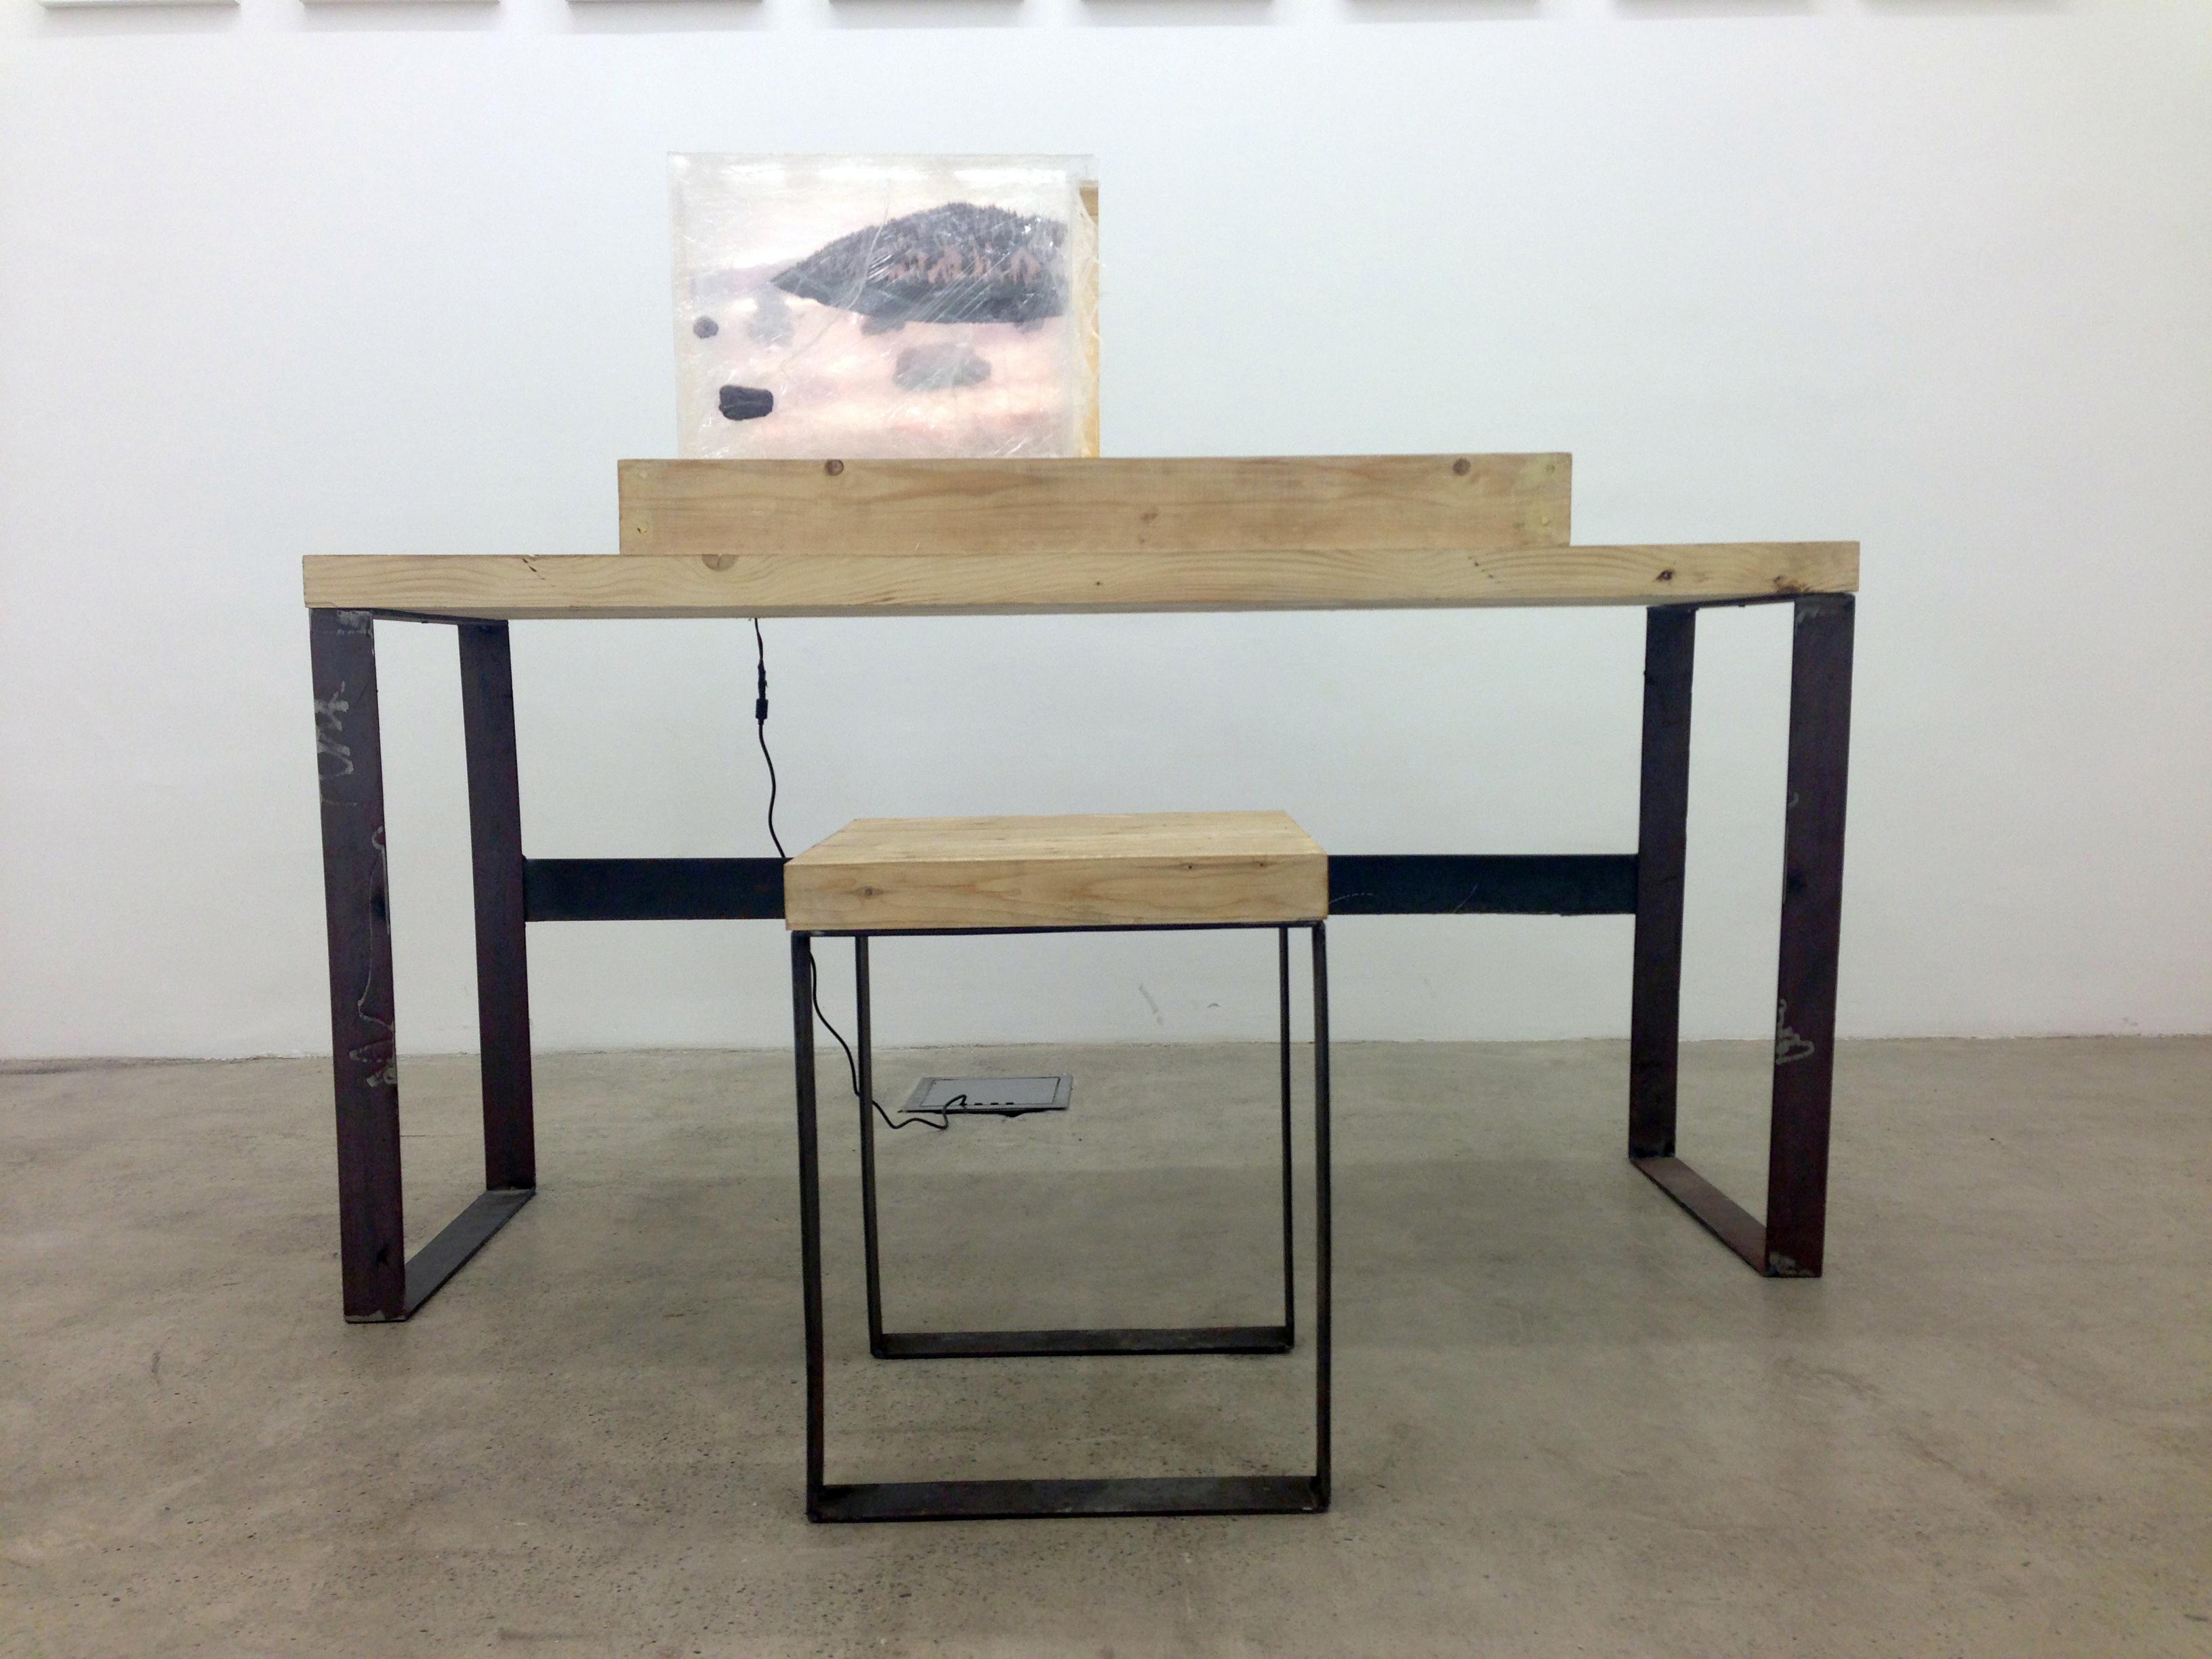 122 X 60 X 150 CM Wood, Iron, Plexiglass Flatbed Print Photo Installation